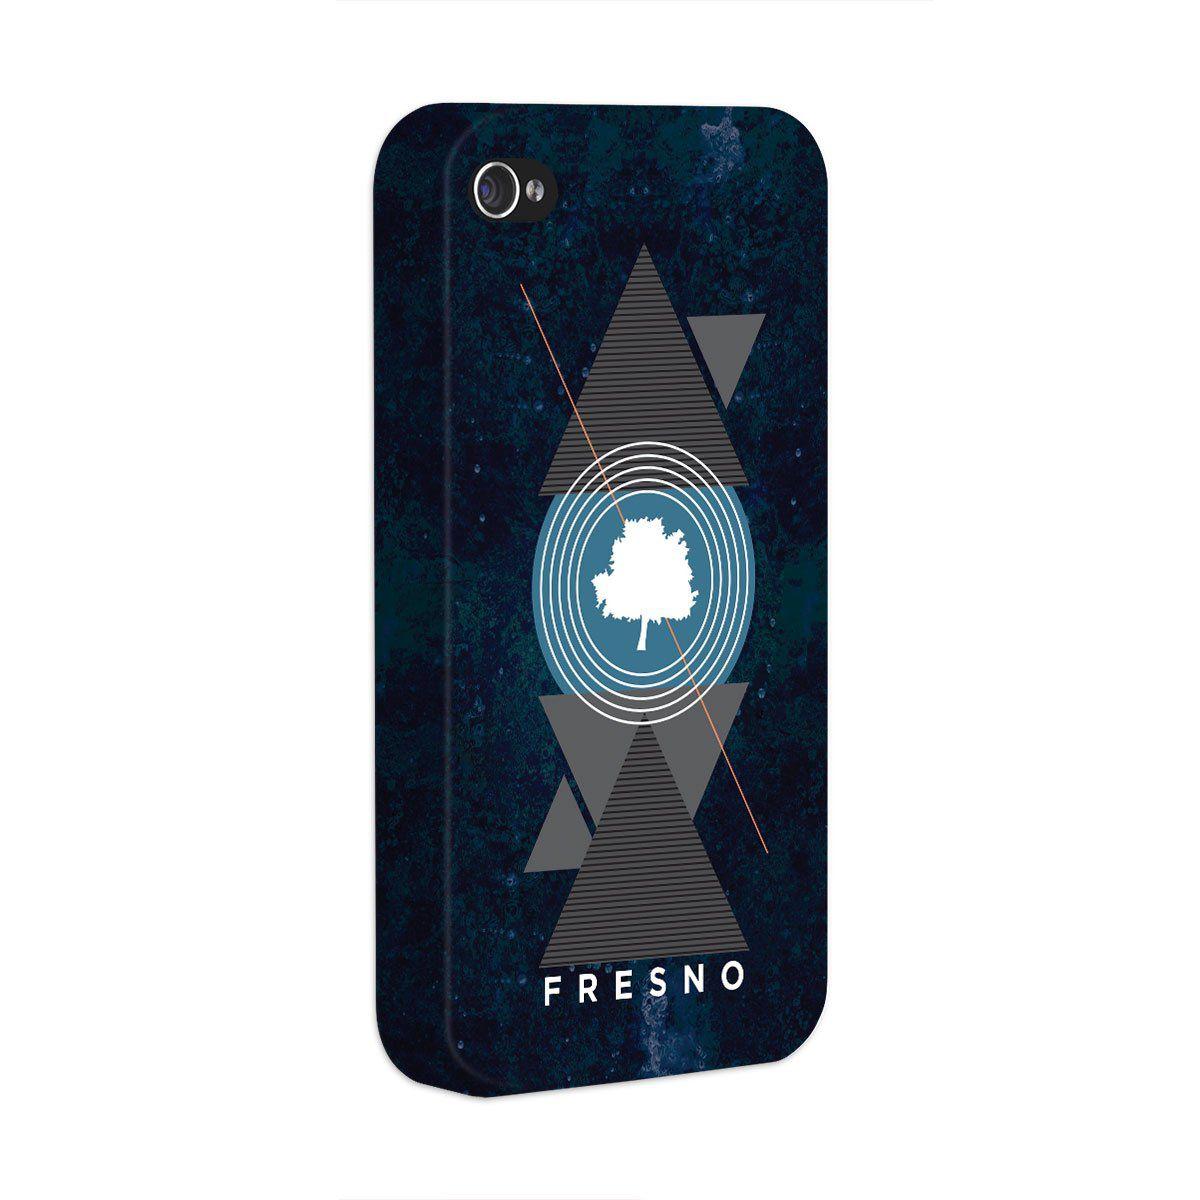 Capa para iPhone 4/4S Fresno Geometric